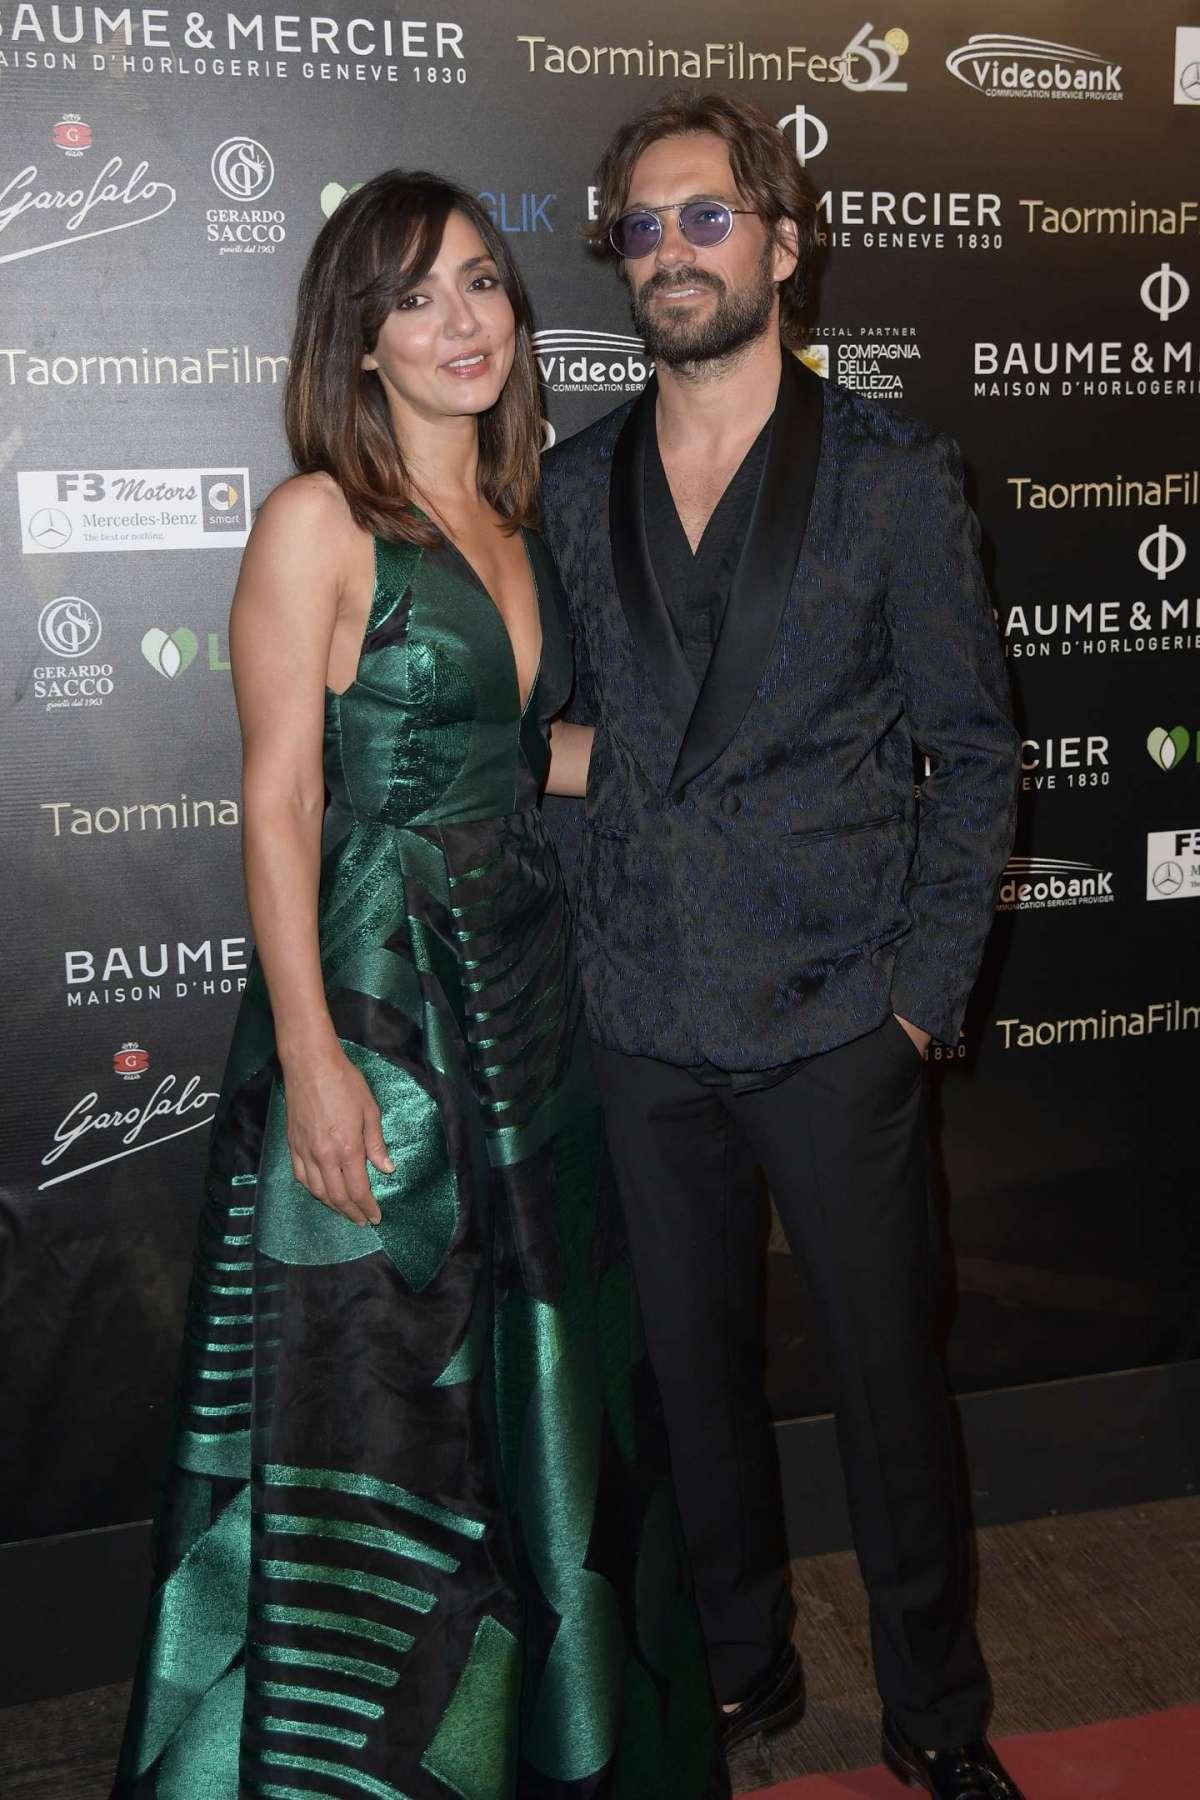 Lorenzo Quaglia e Ambra Angiolini elegantissimi e felici